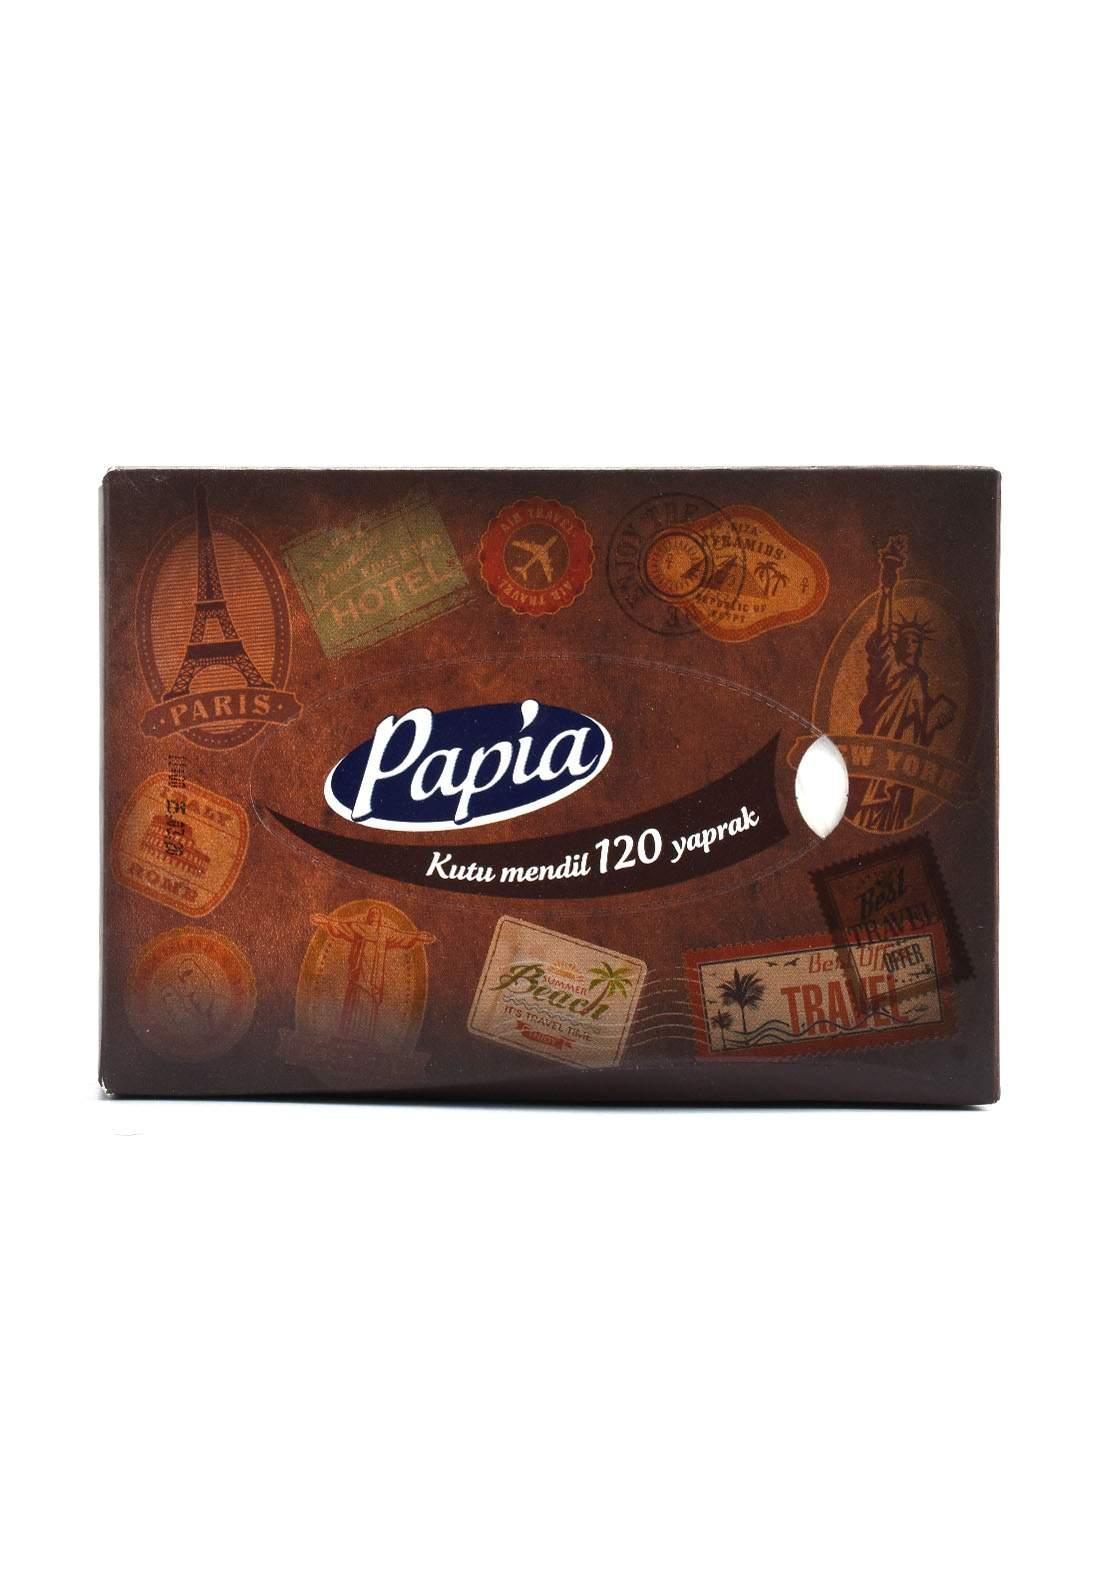 Papia Tissue Paper 120 Sheets  مناديل ورقية